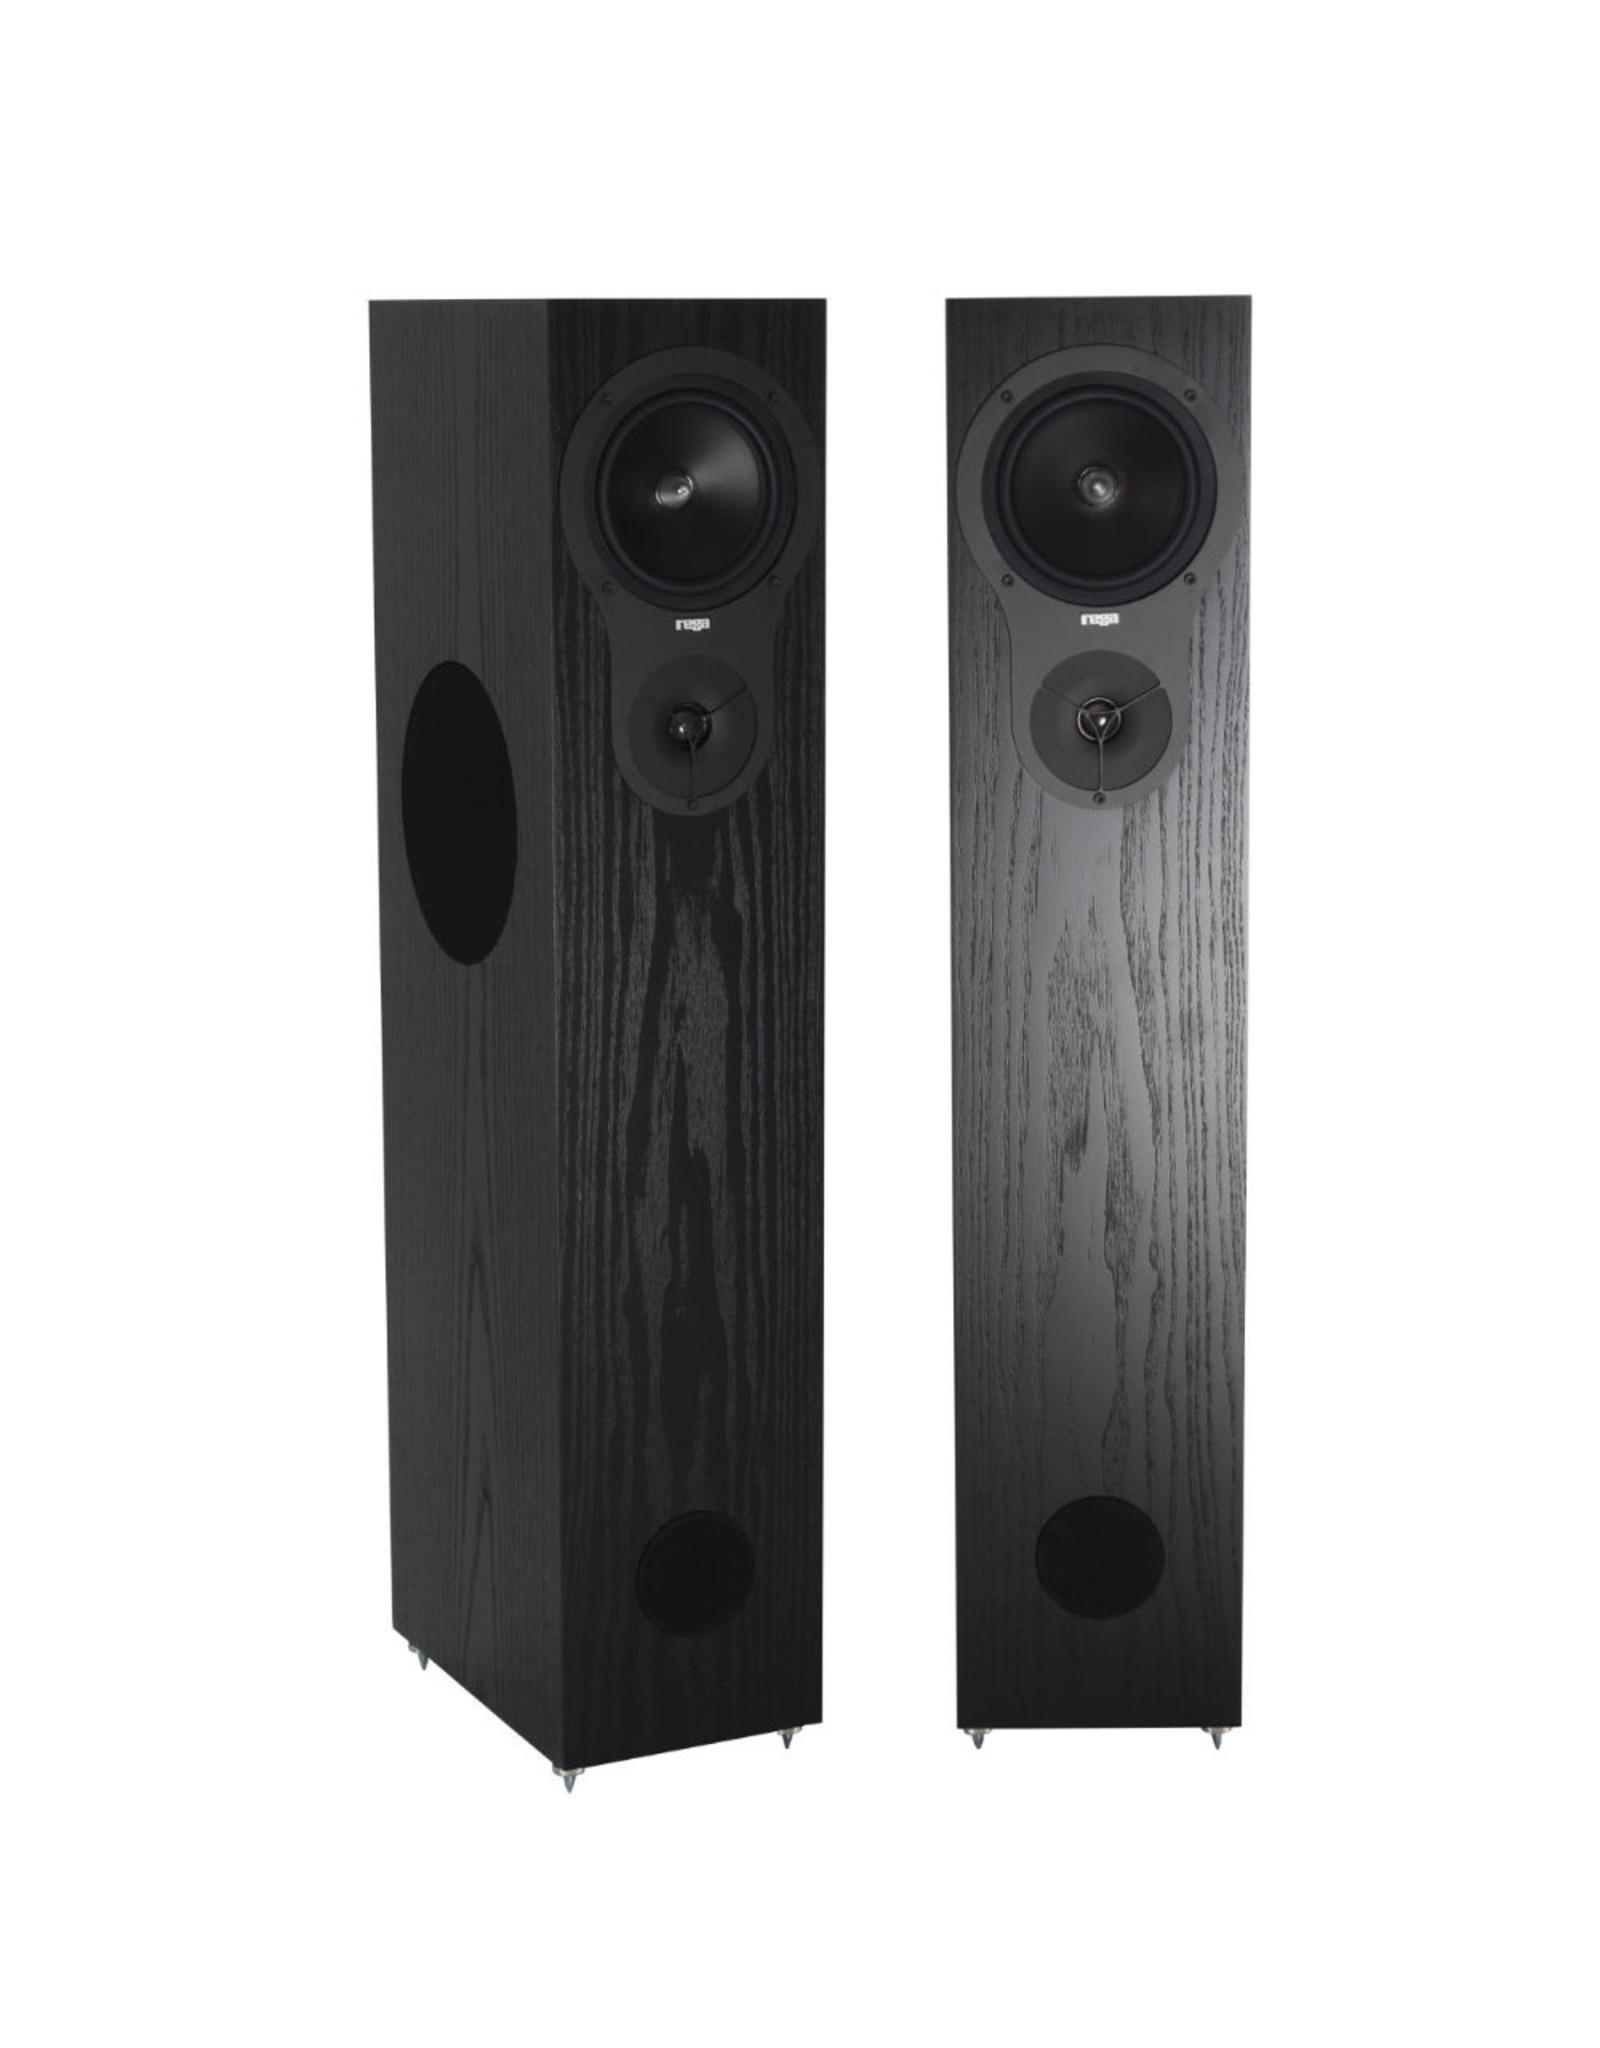 Rega Rega RX3 Floorstanding Speakers